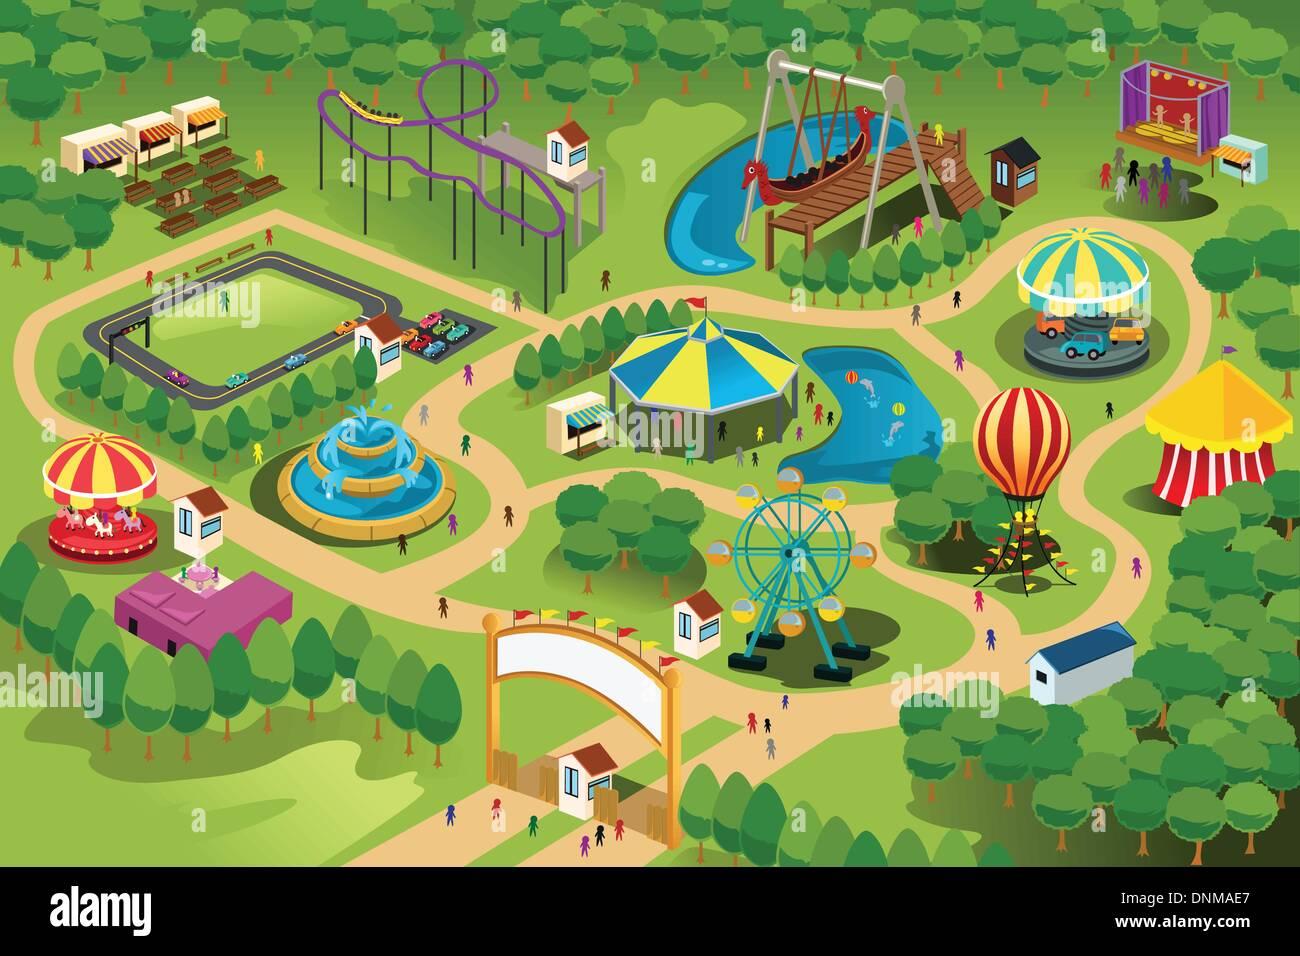 Theme park map template juvecenitdelacabrera theme park map template toneelgroepblik Images